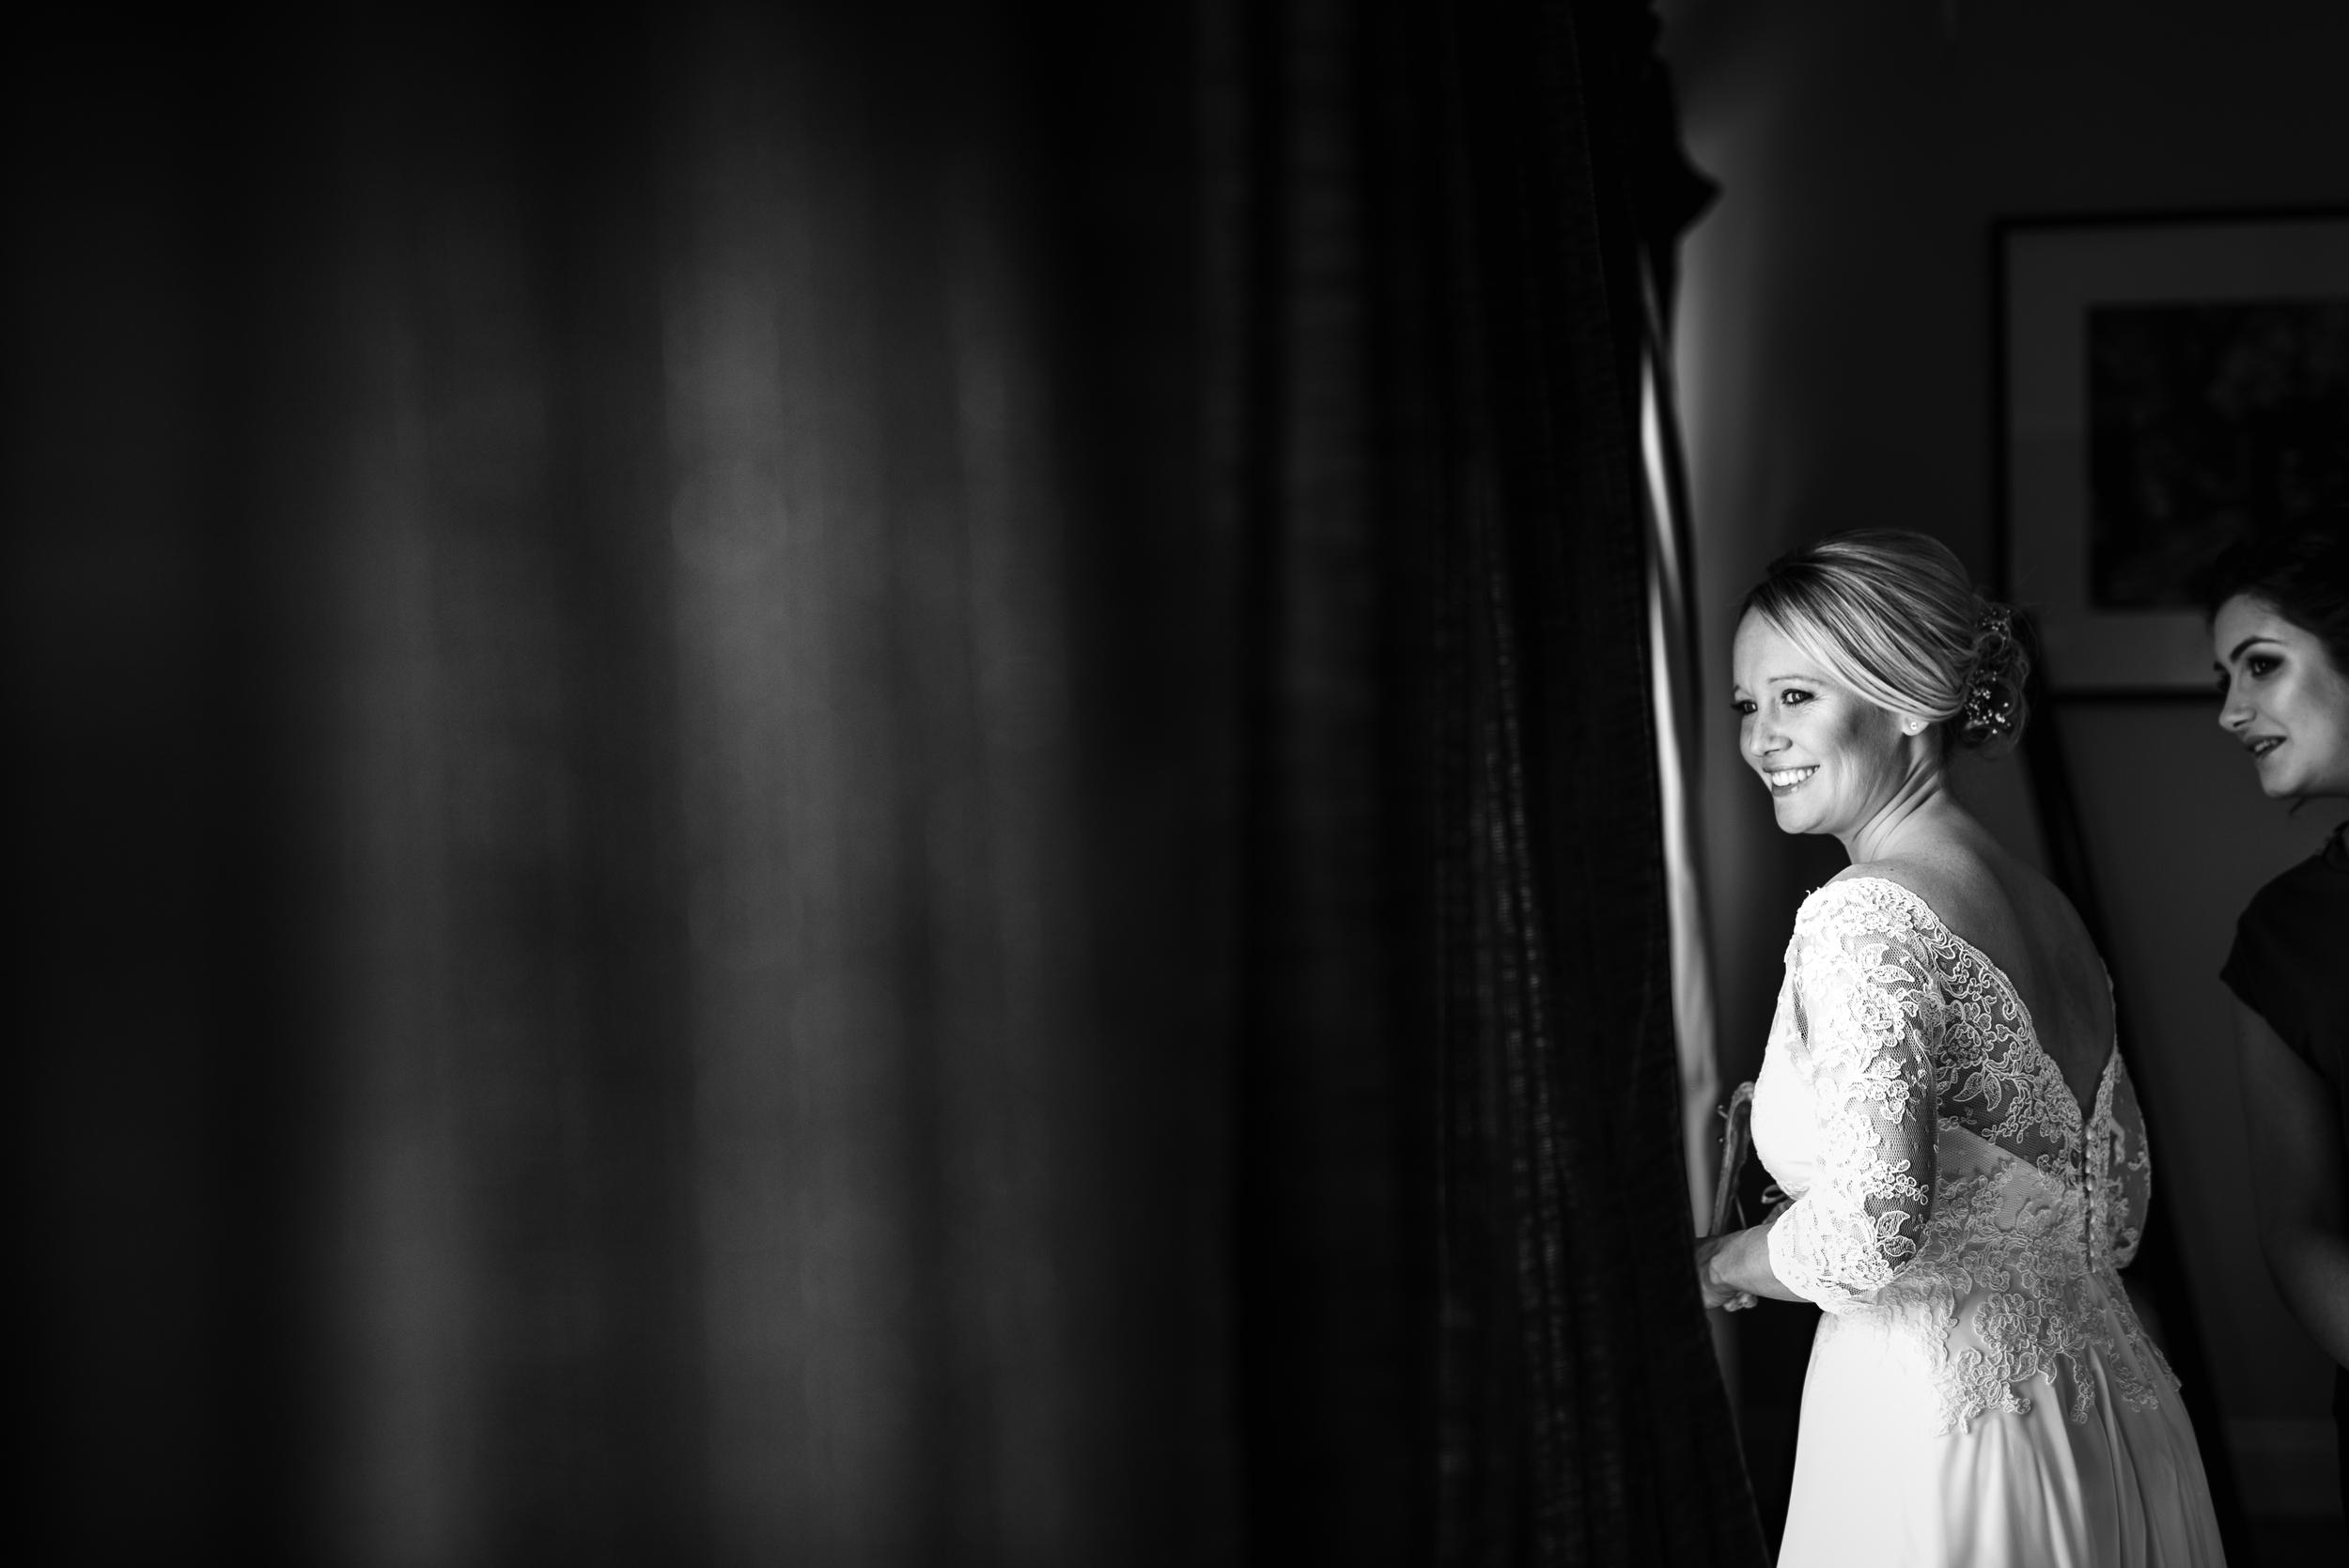 Wasing Park Wedding Photography - Emma & Sarah-91.jpg